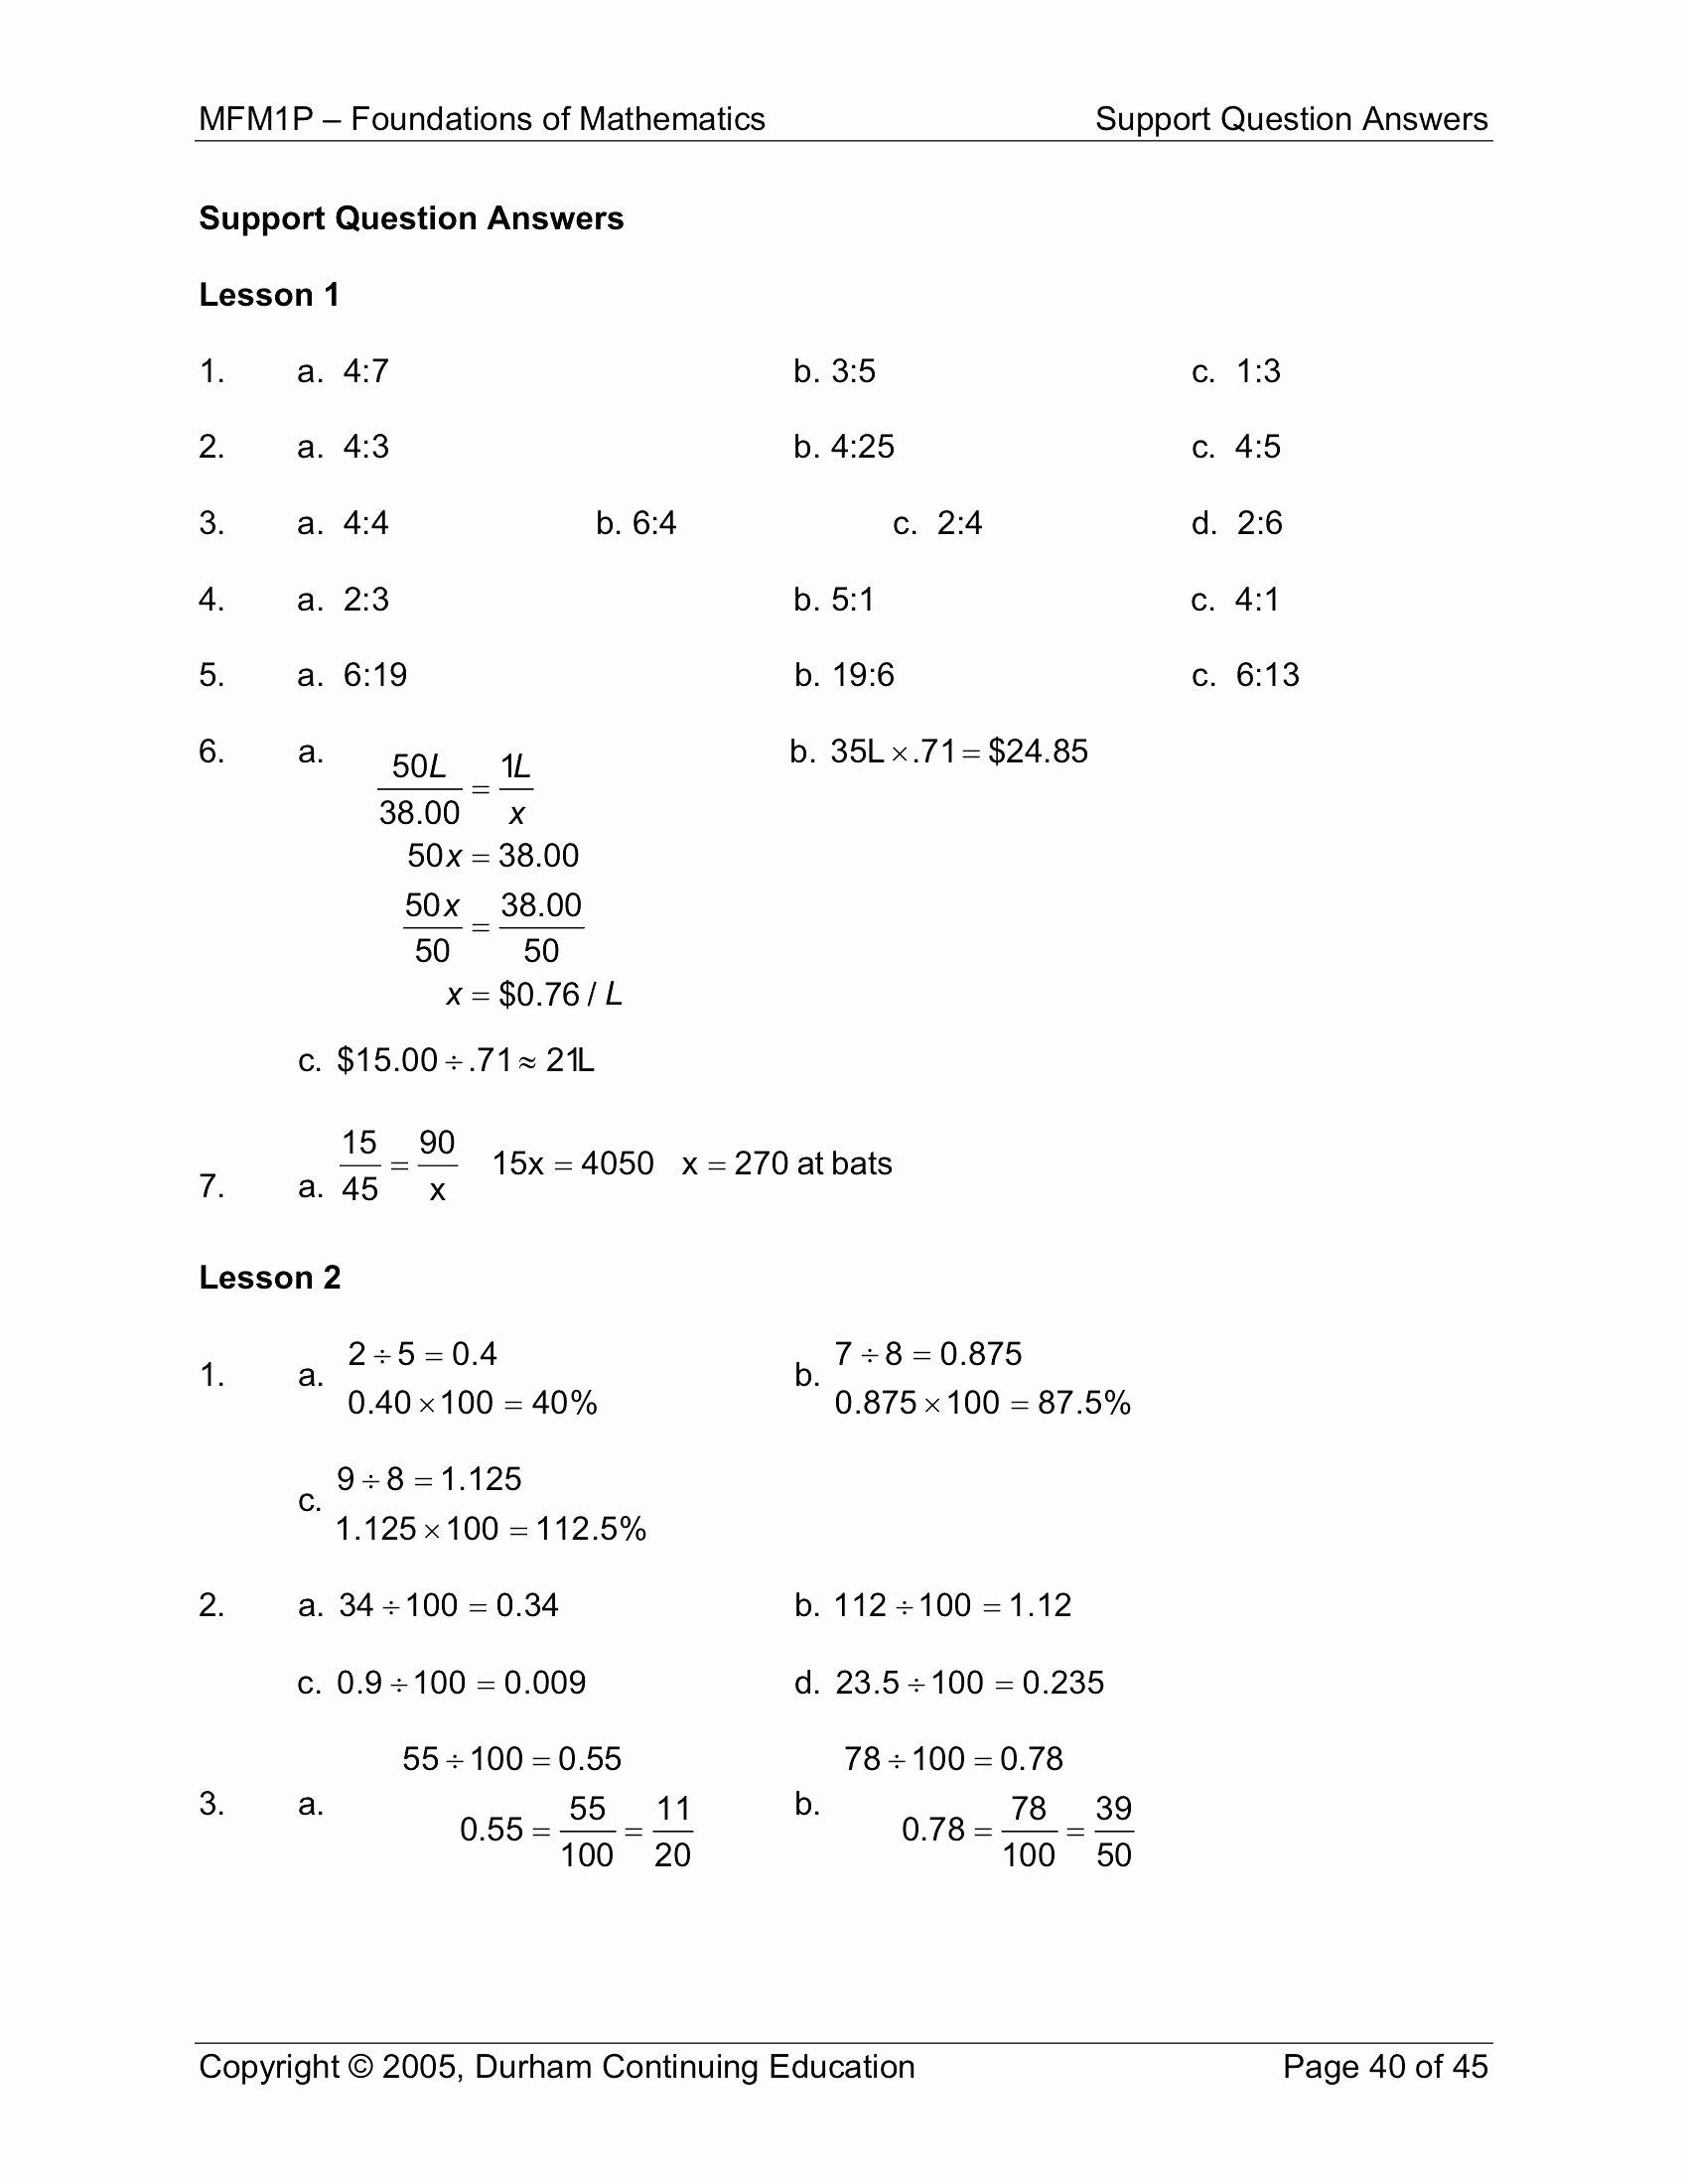 9th Grade Vocabulary Worksheet Unique 9th Grade Vocabulary Worksheets the Best Worksheets Image